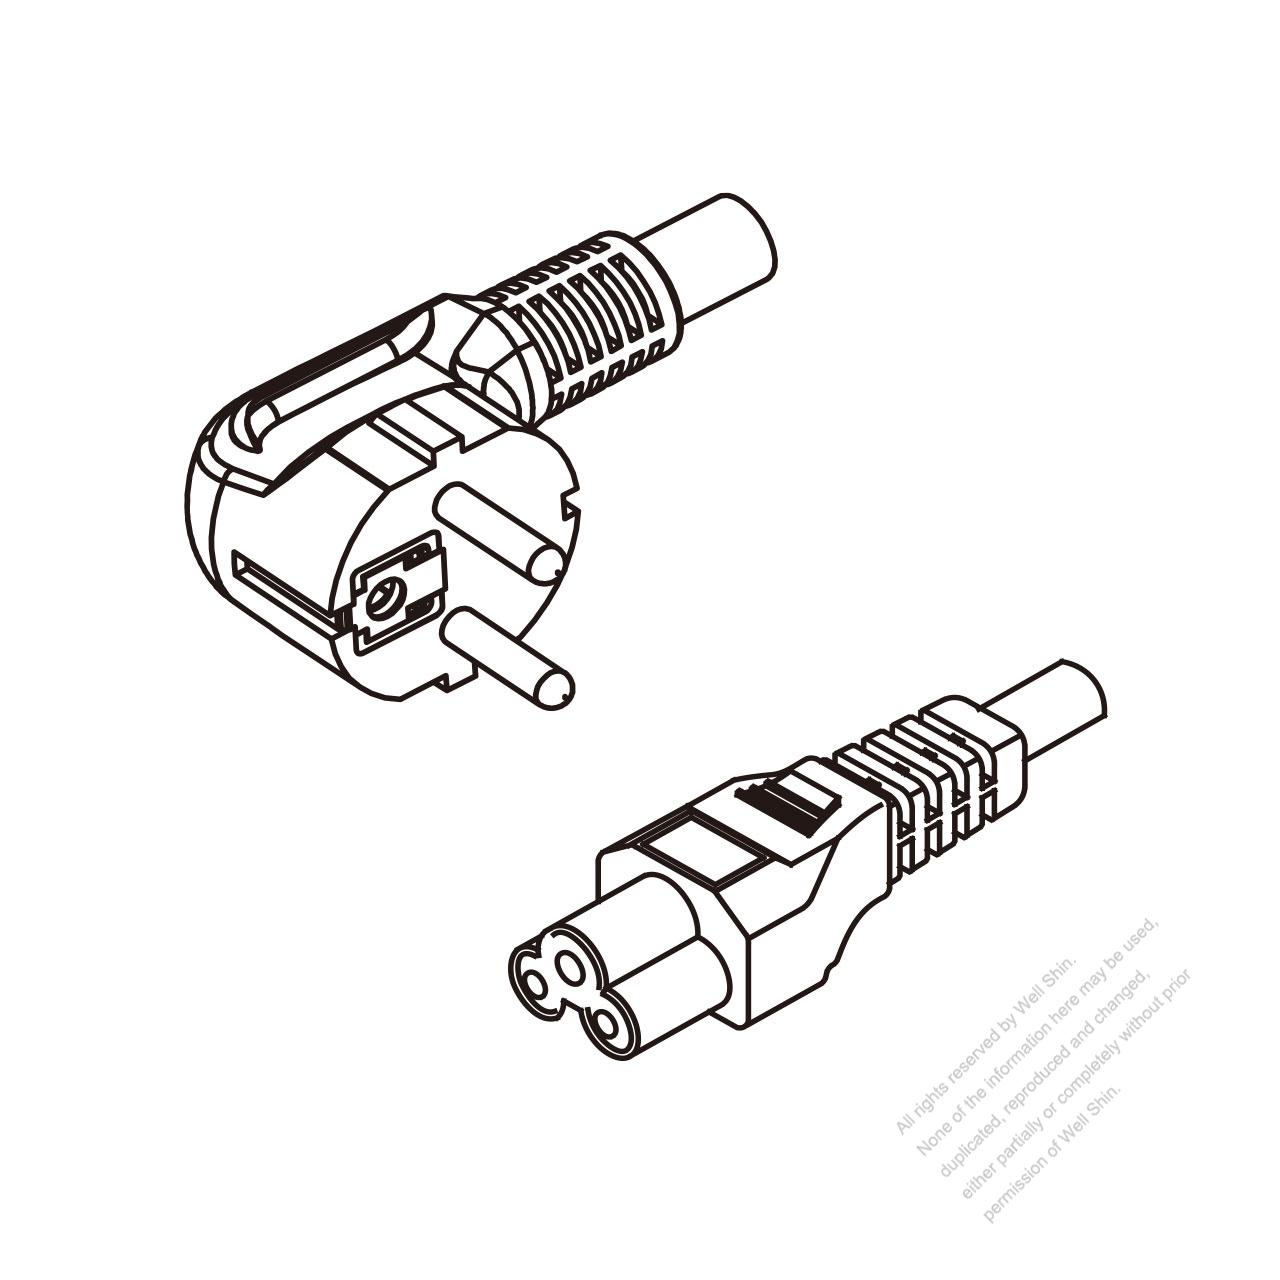 Europe 3 Pin Angle Plug To Iec 320 C5 Ac Power Cord Set